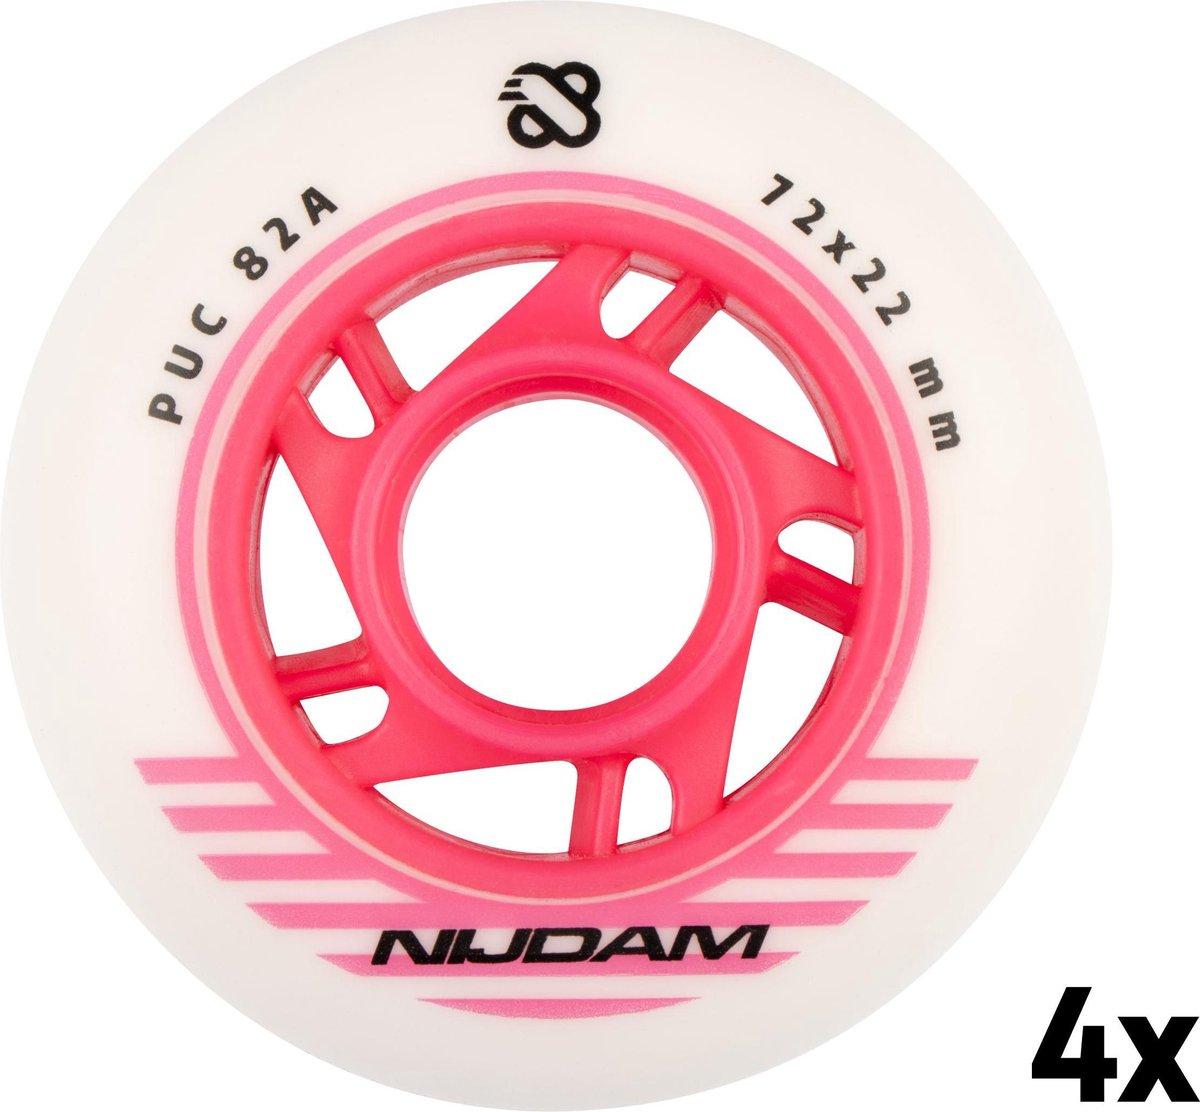 Nijdam Inline Skate Wielen Set - 72x22 mm - 4st - White - Wit/Roze/Zwart